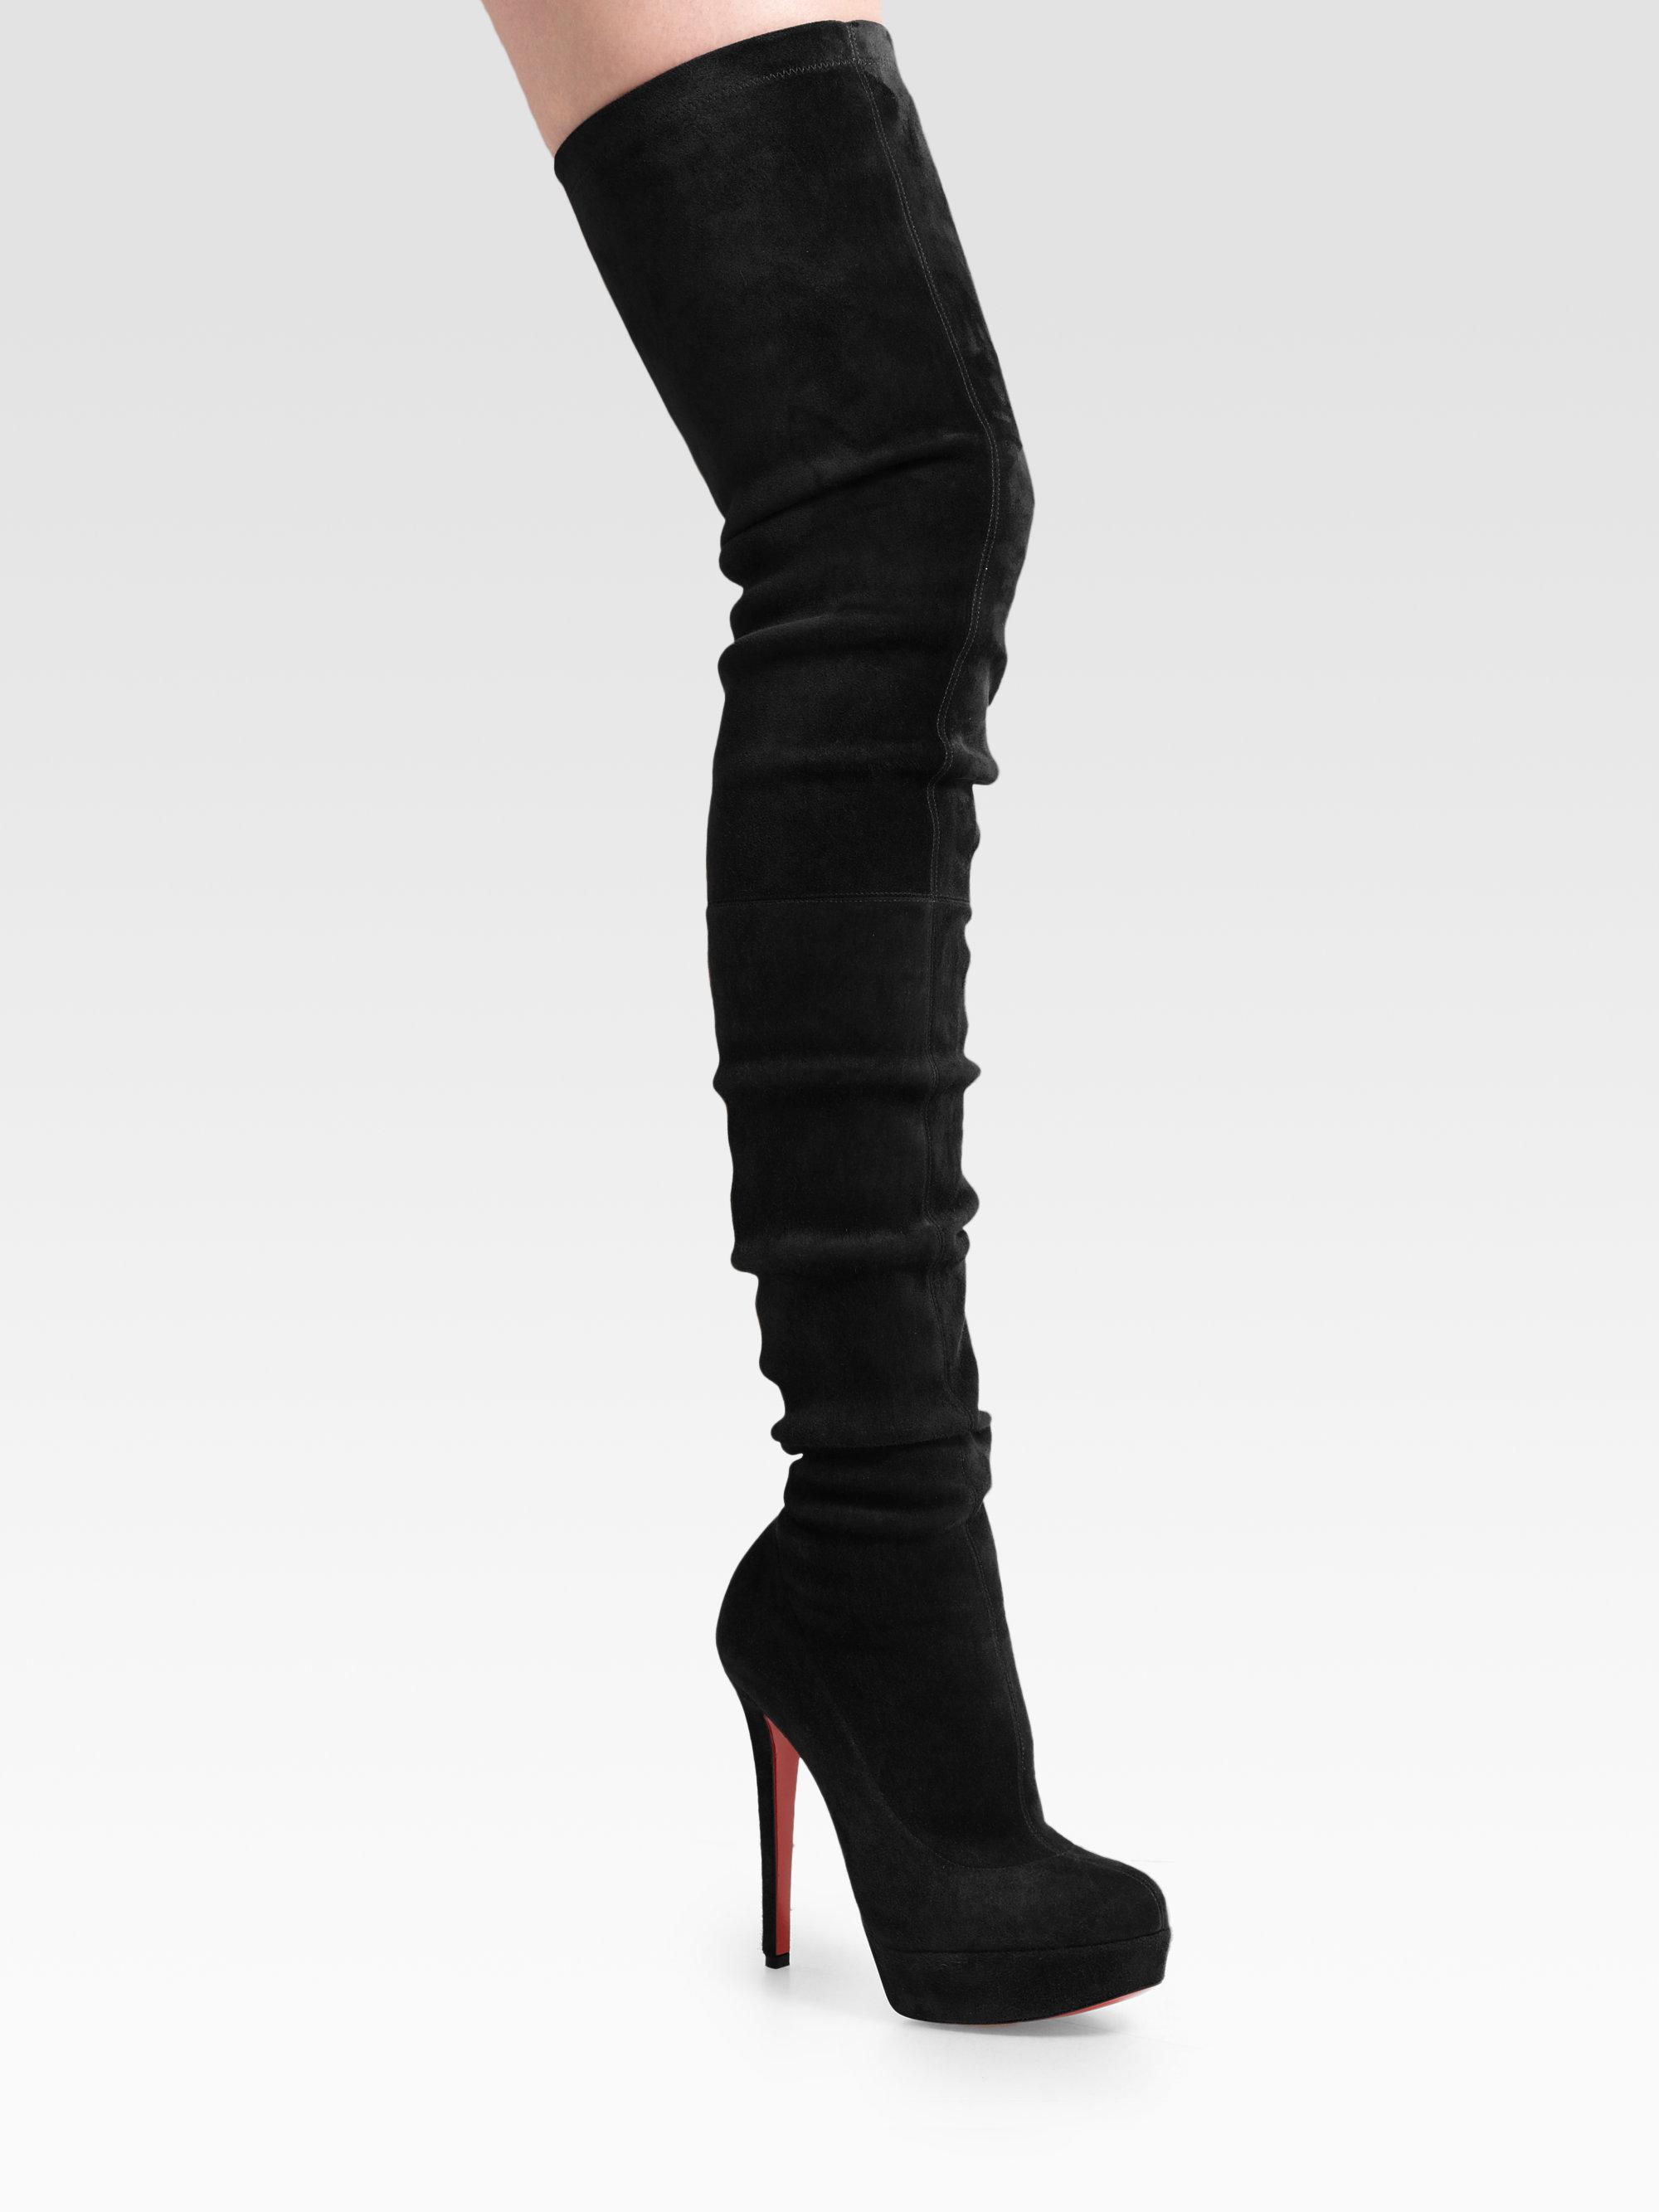 32ce847ad62 Christian Louboutin Black Gazolina Suede Overtheknee Boots